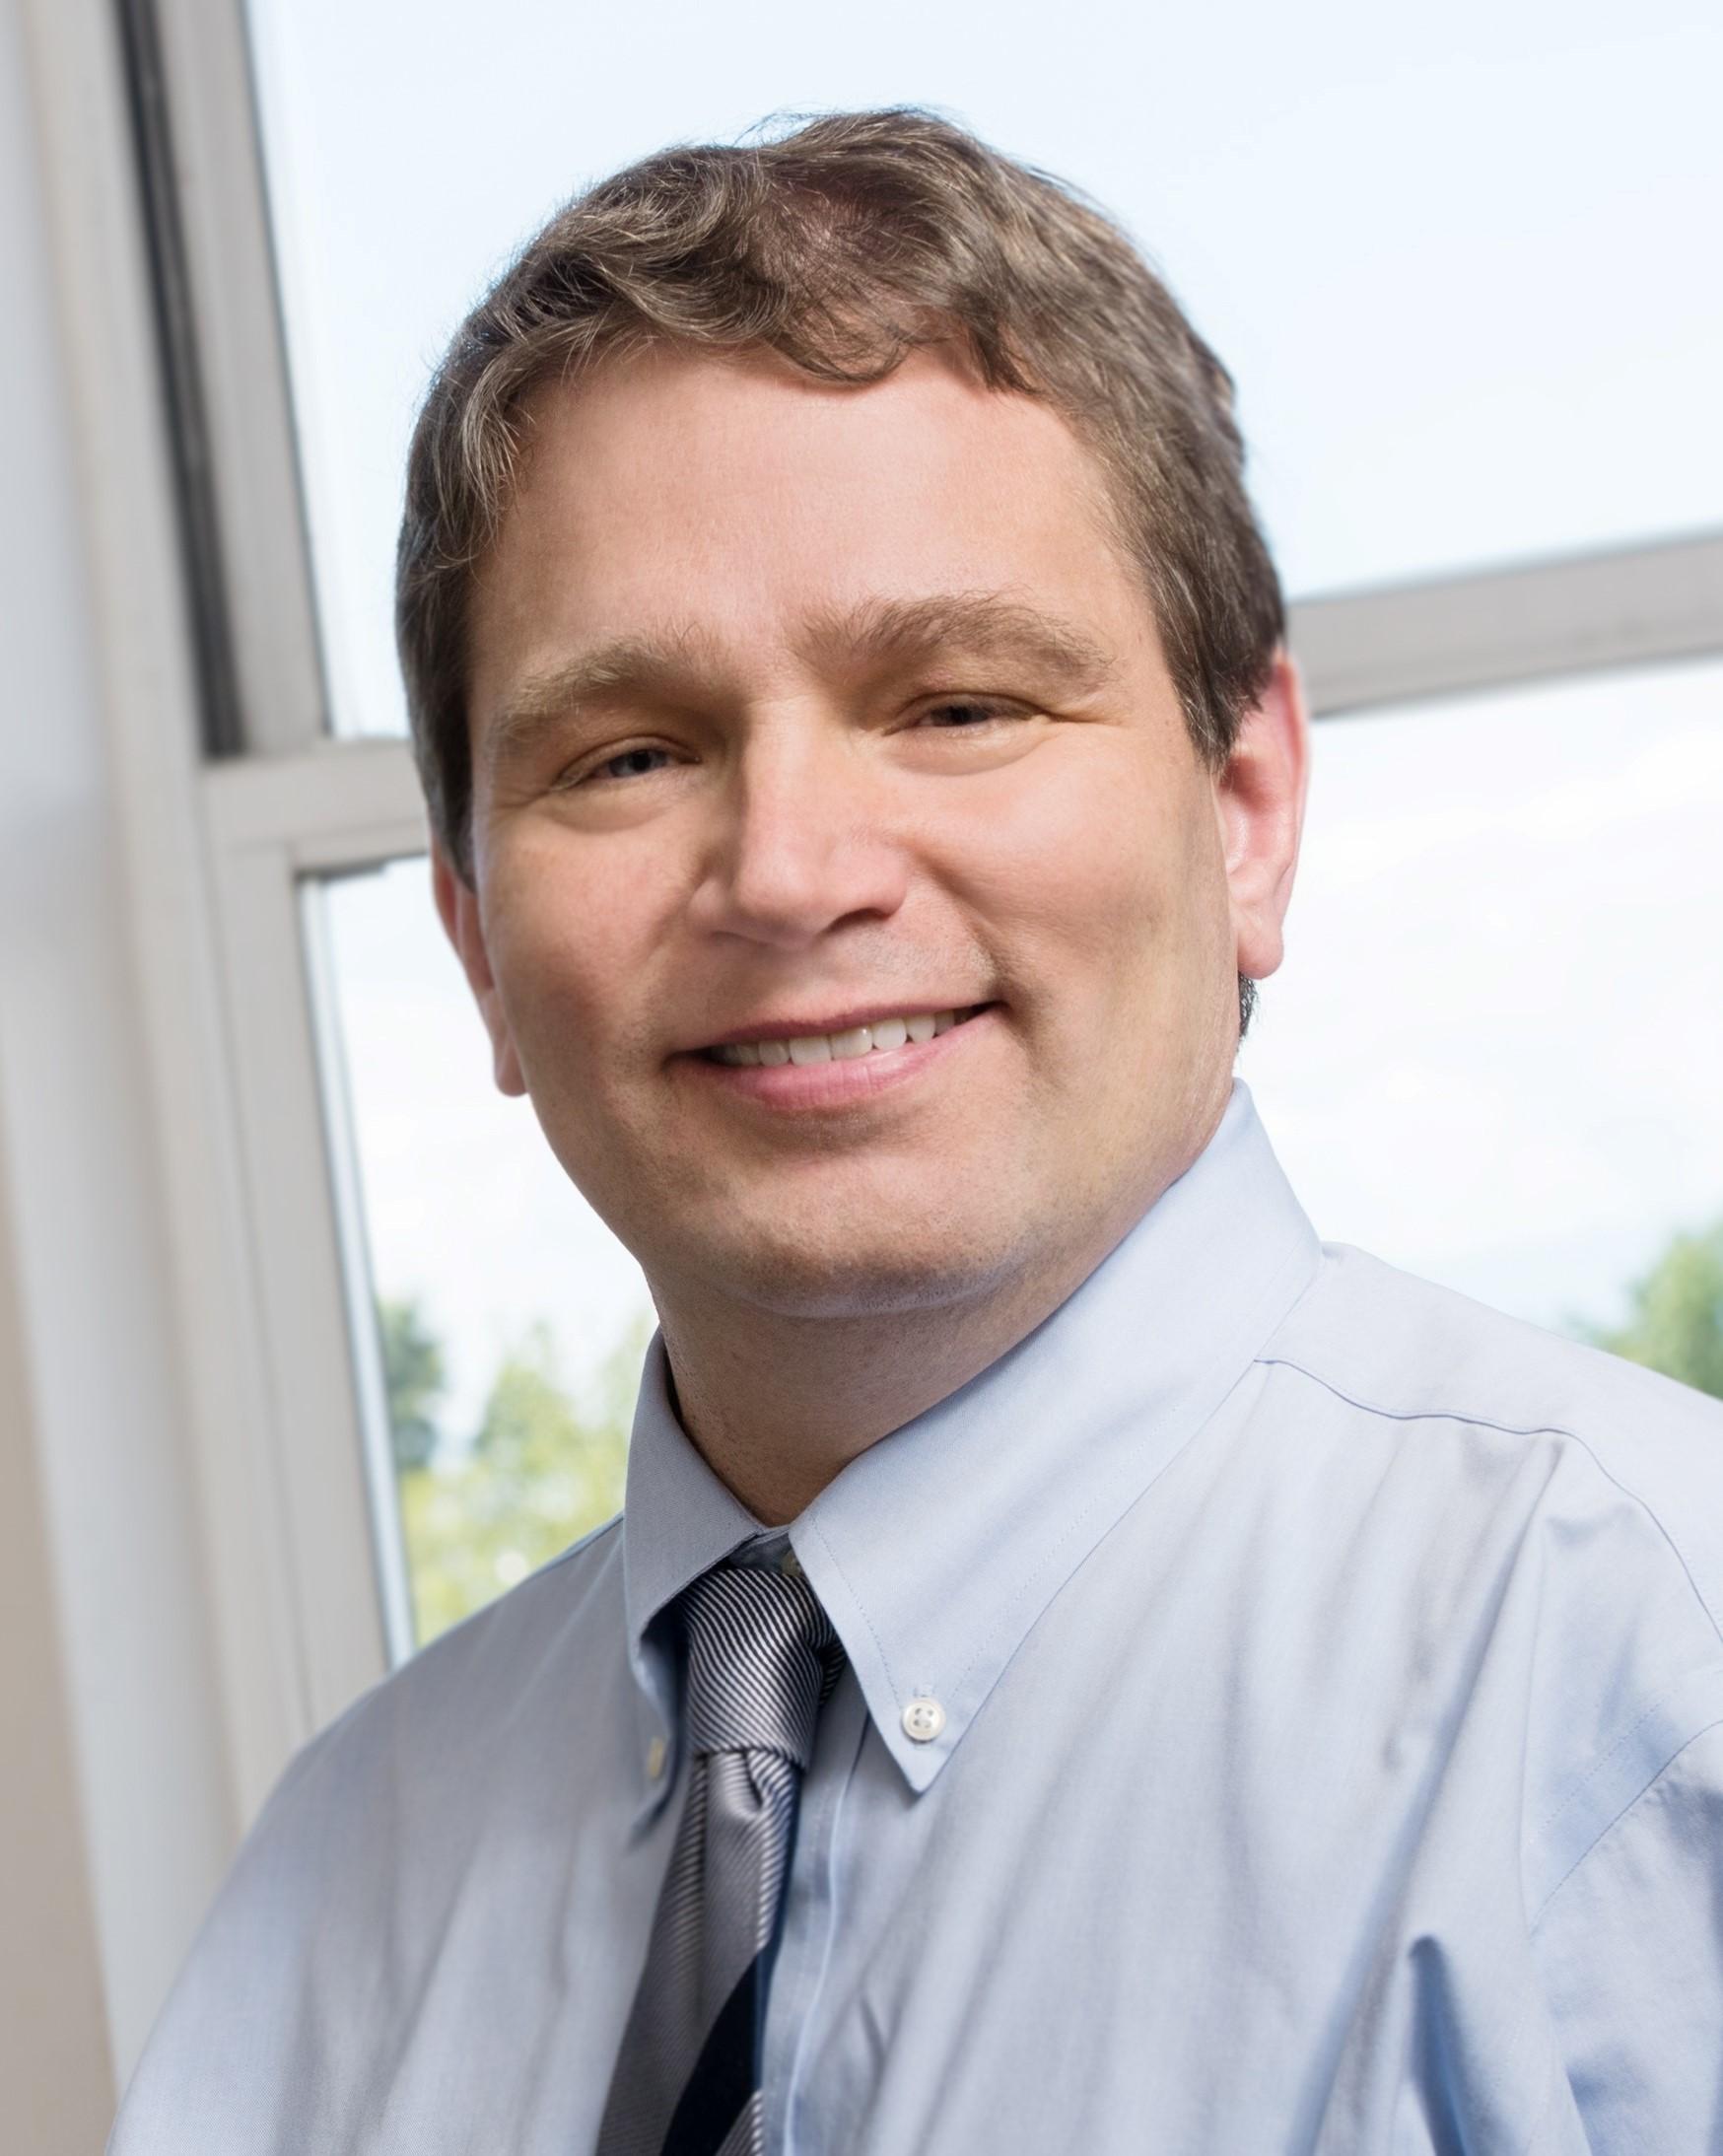 Steve Gerlach